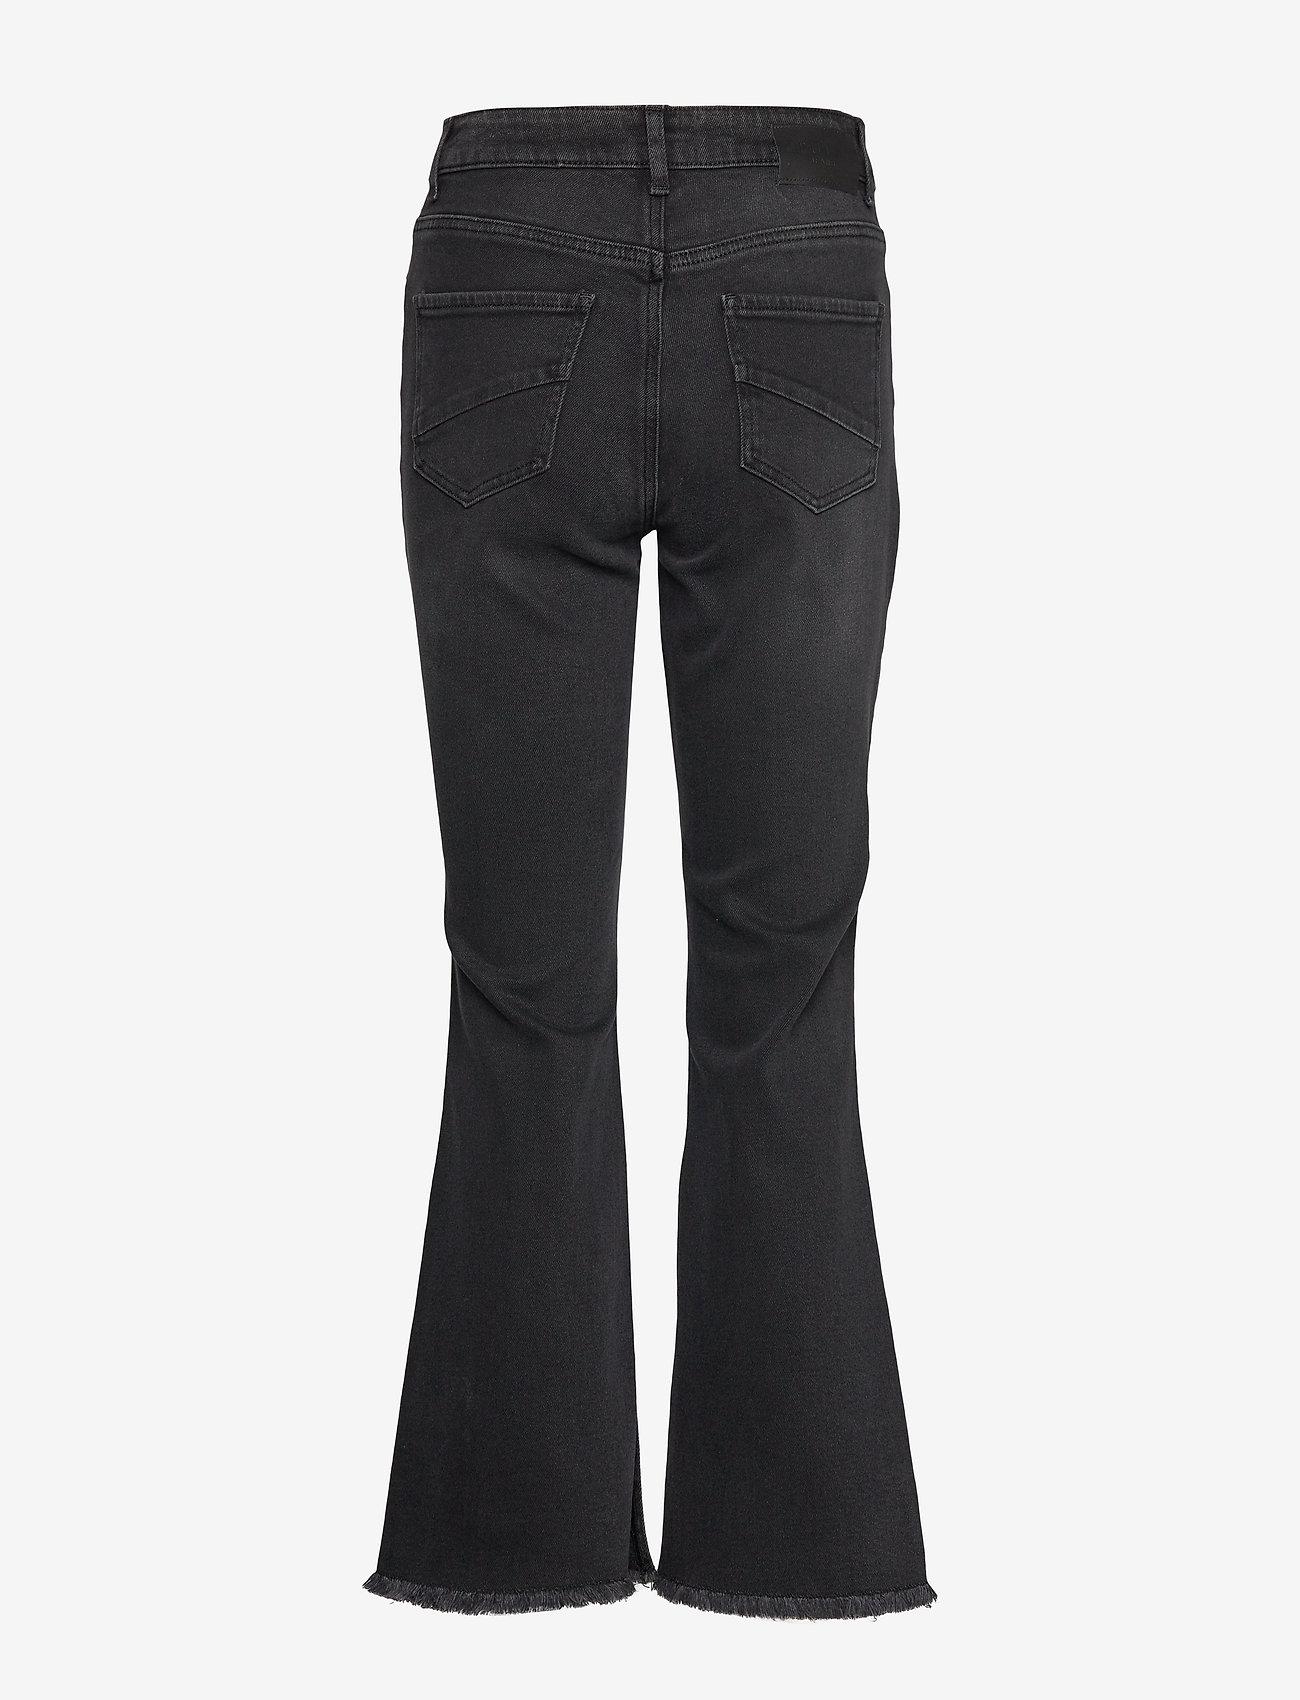 Pzliva Ultra High Waist Flared (Black Denim) - Pulz Jeans 7TJx0s